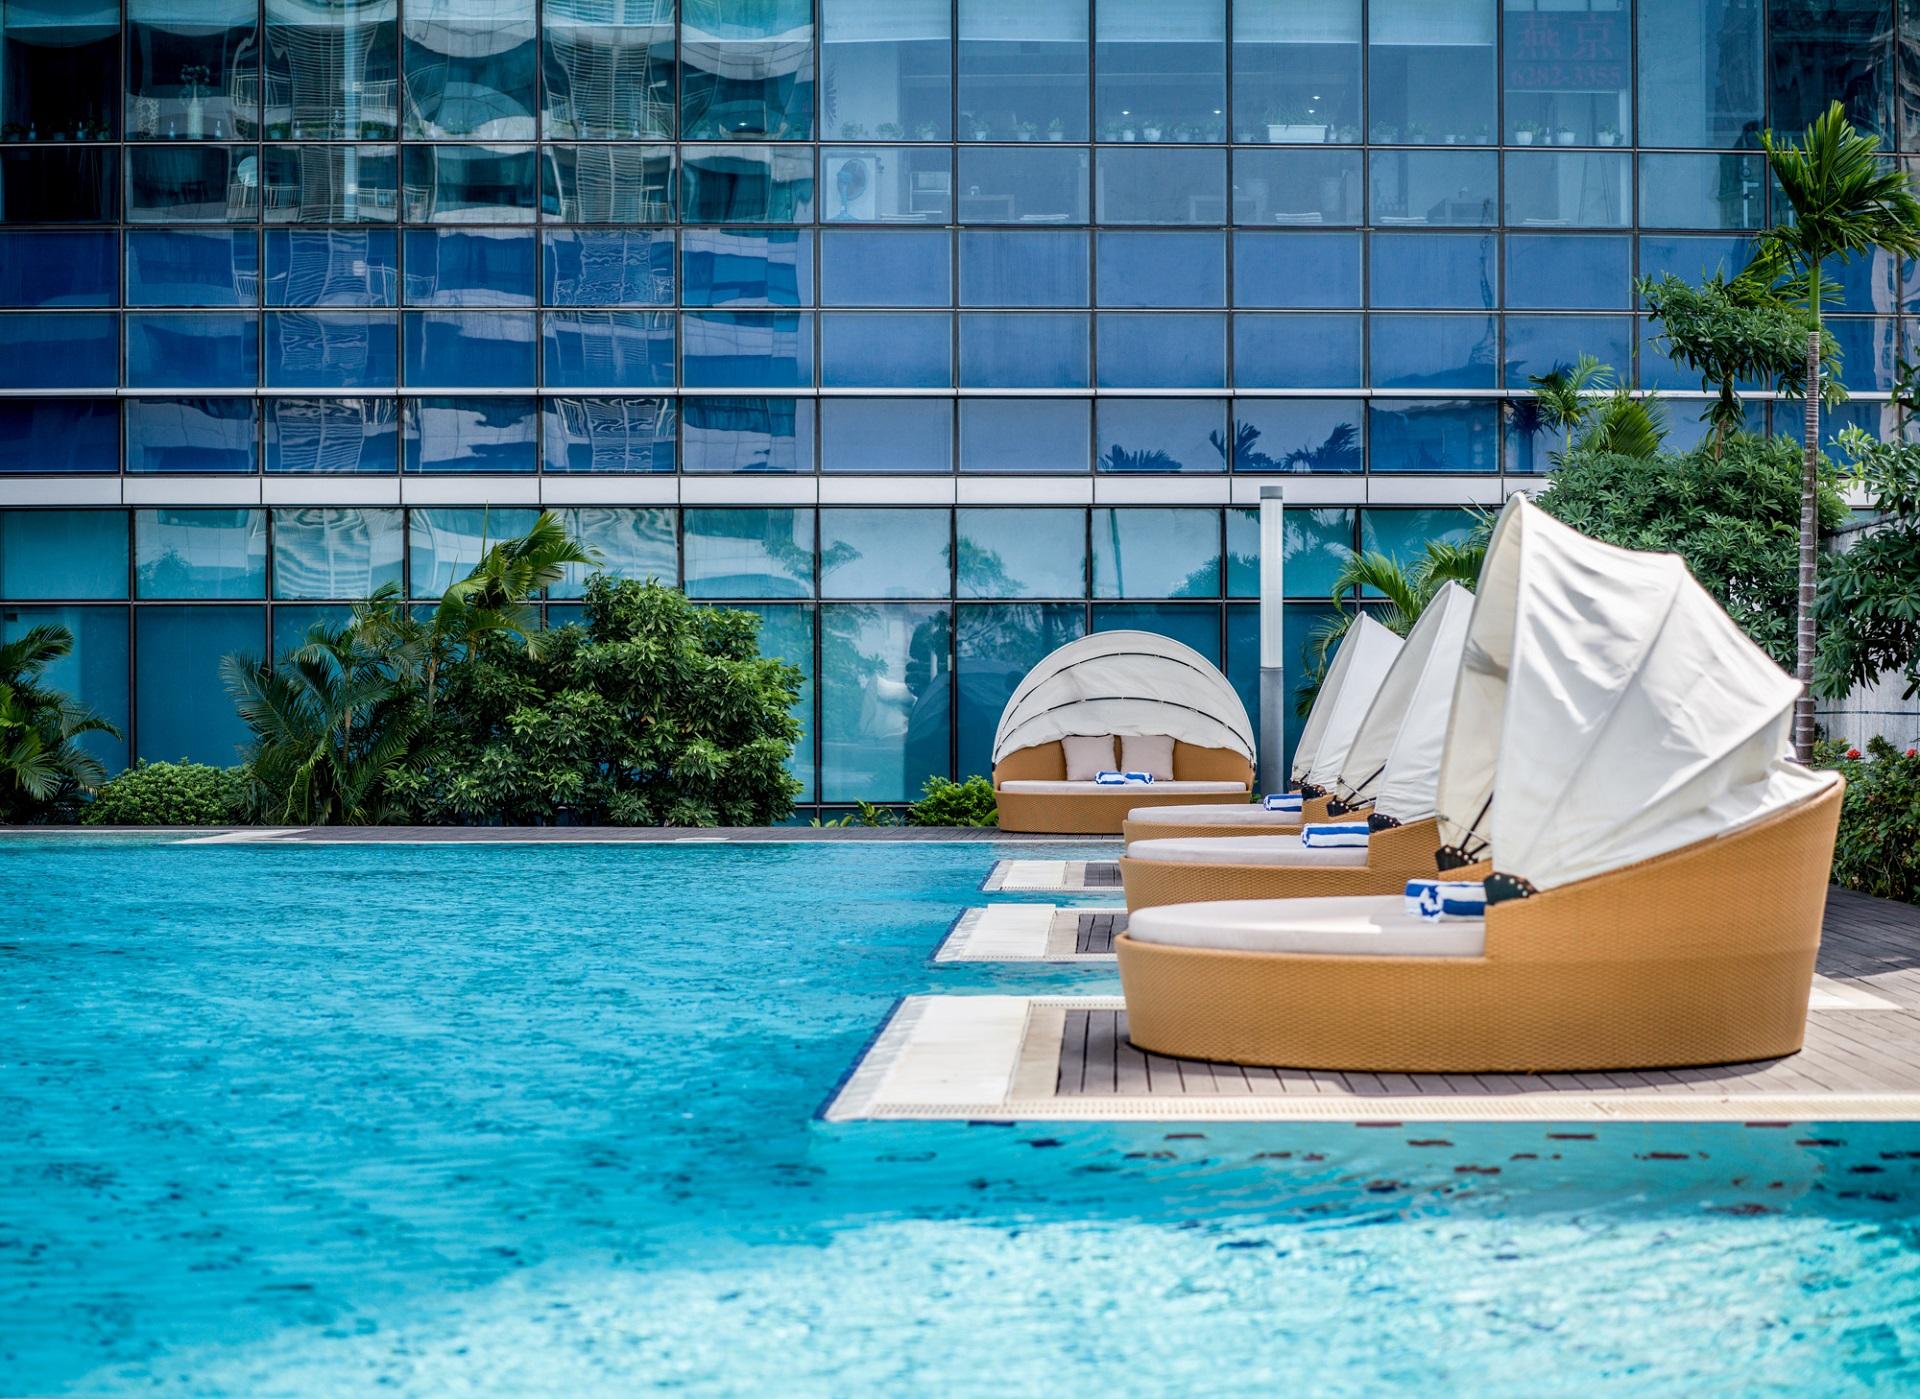 Hanoi hotel sunloungers